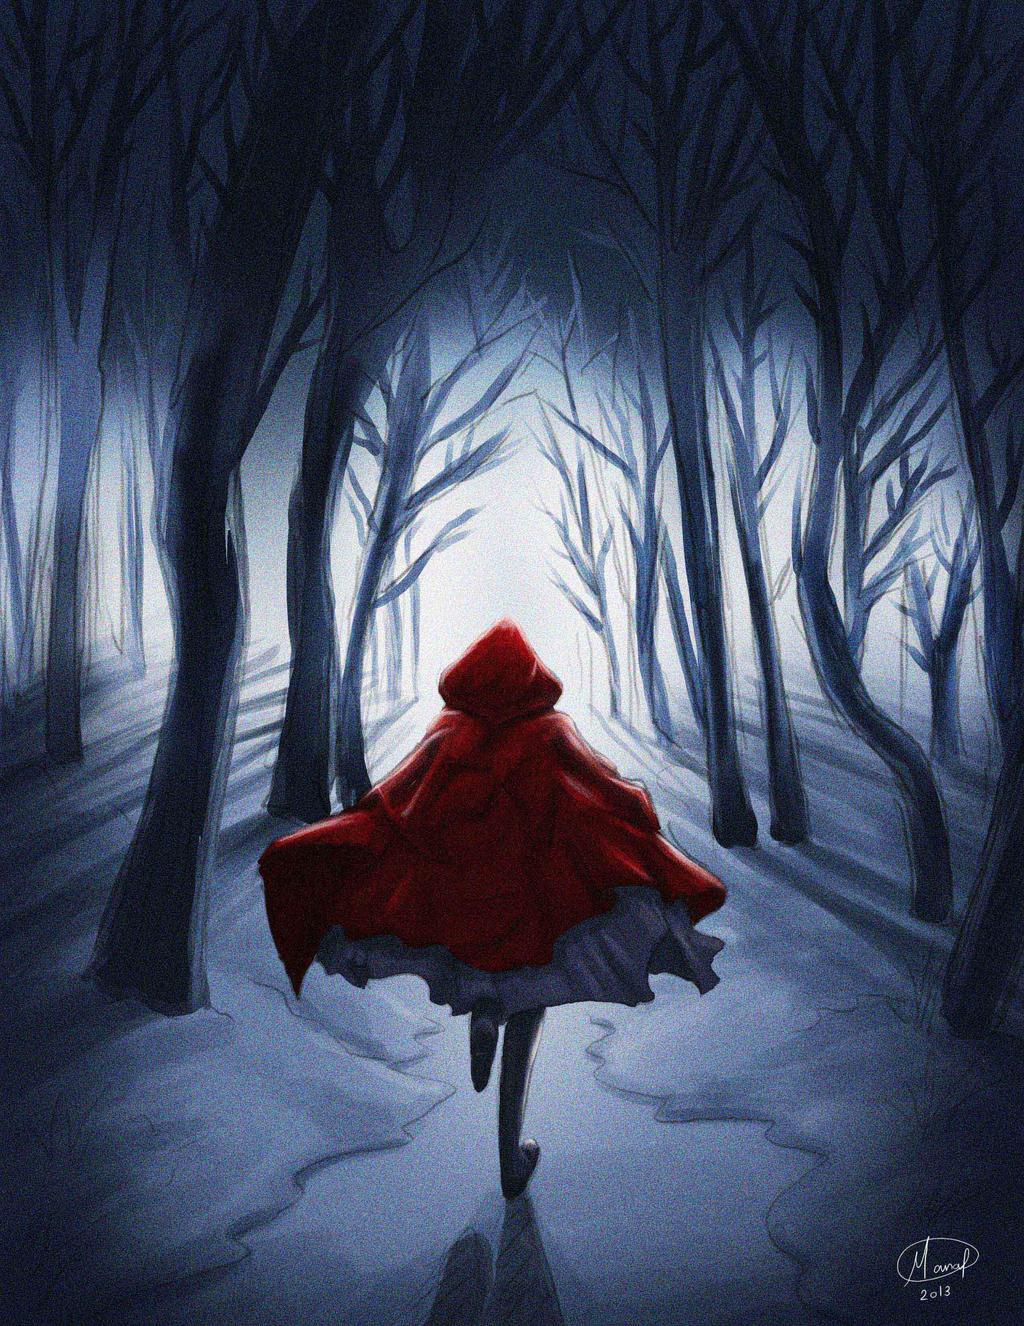 Running Away (red riding hood) by manalsh88 on DeviantArt